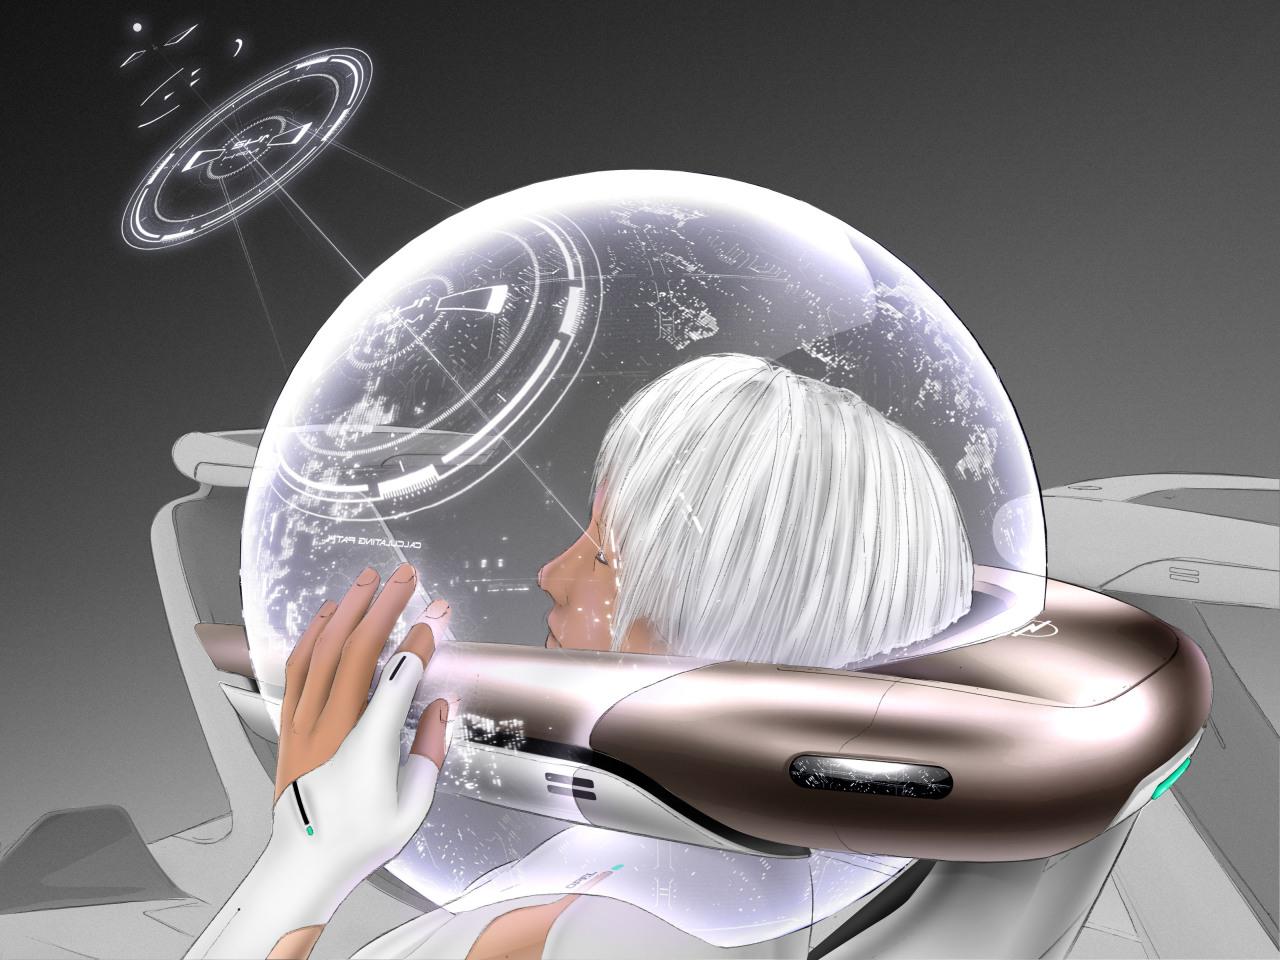 erik saetre - virtually real, or really virtual?